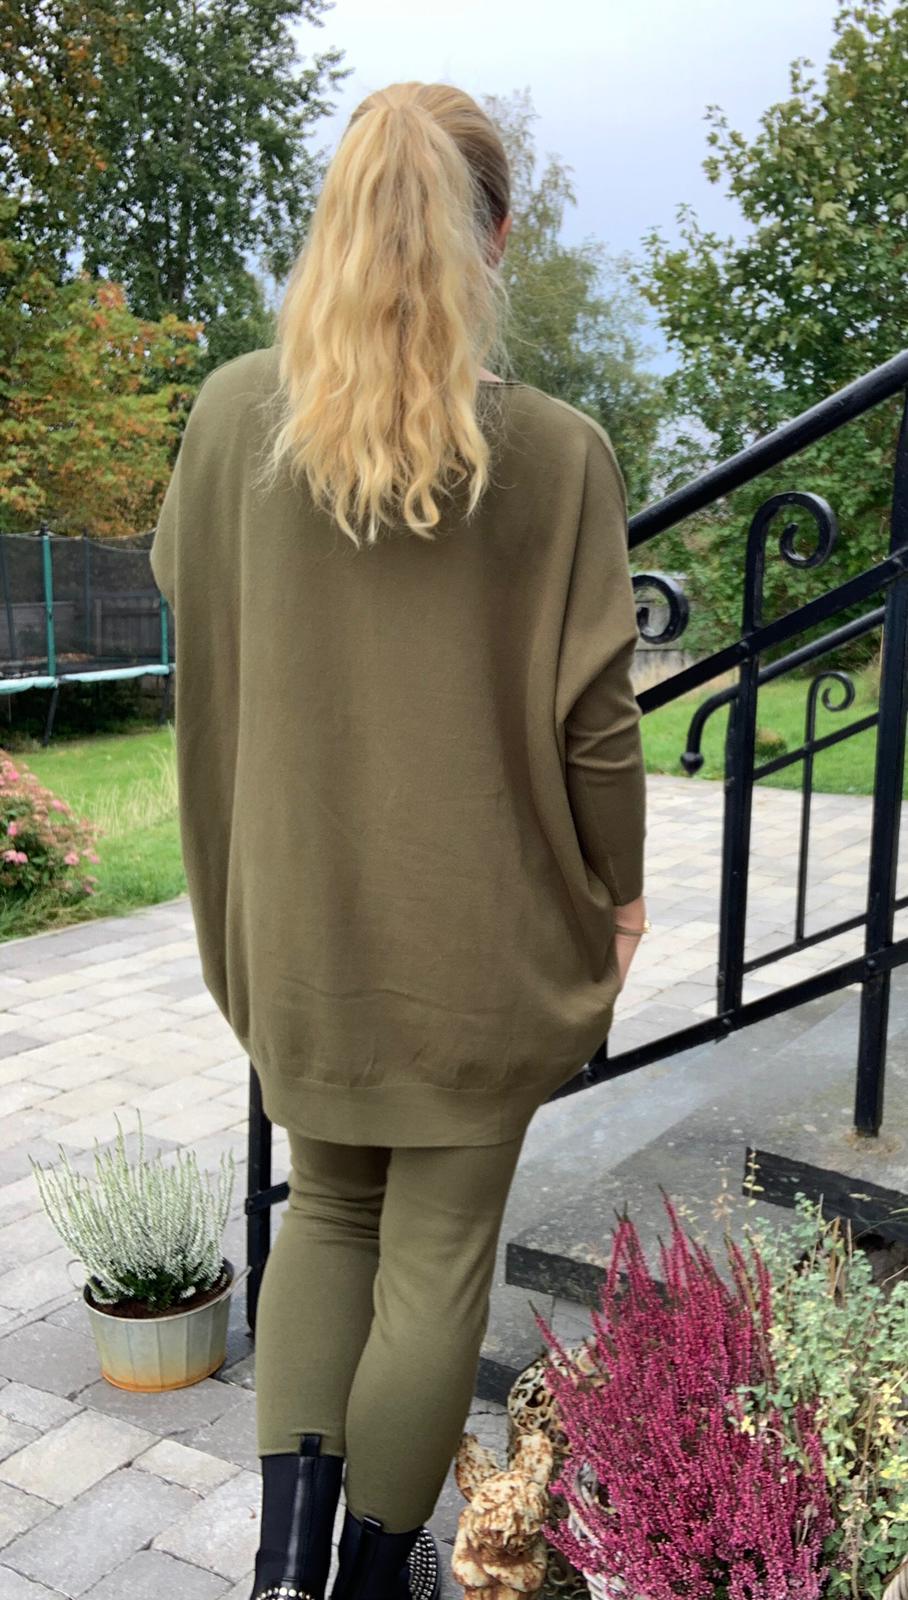 Brittany-khaki-mobil-ute-3